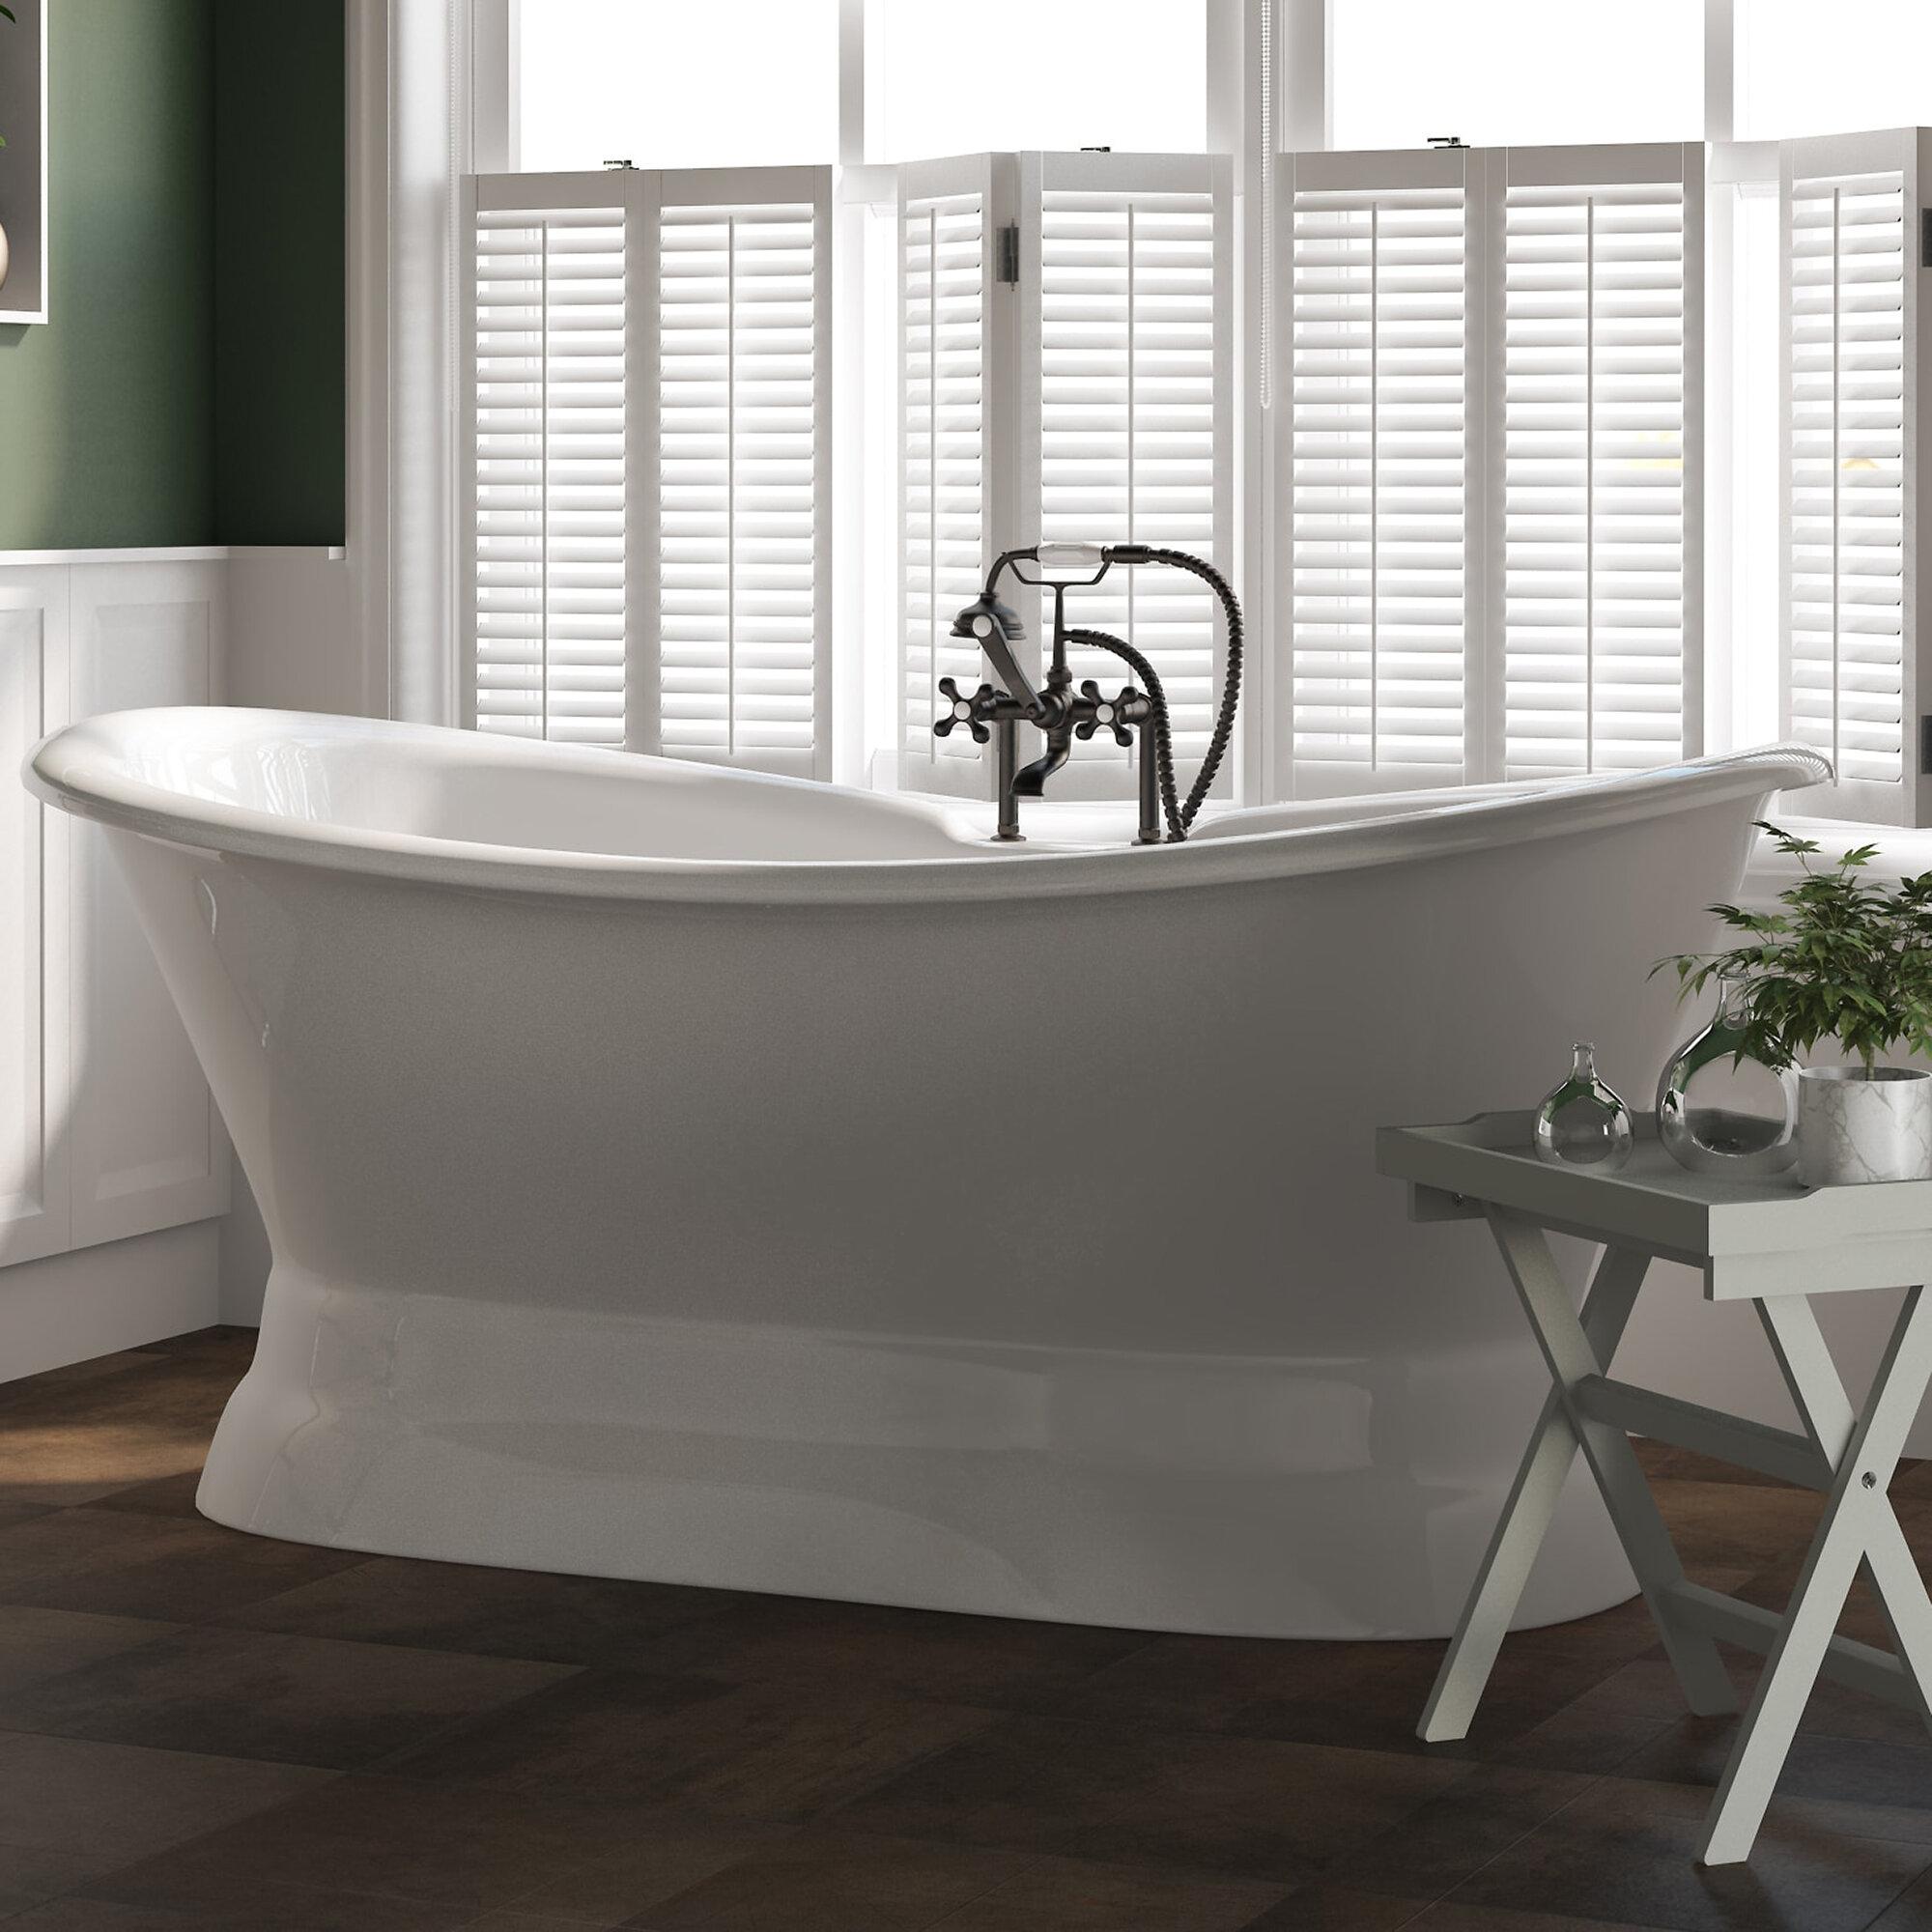 Picture of: Cambridge Plumbing None 72 X 30 Pedestal Bathtub Reviews Wayfair